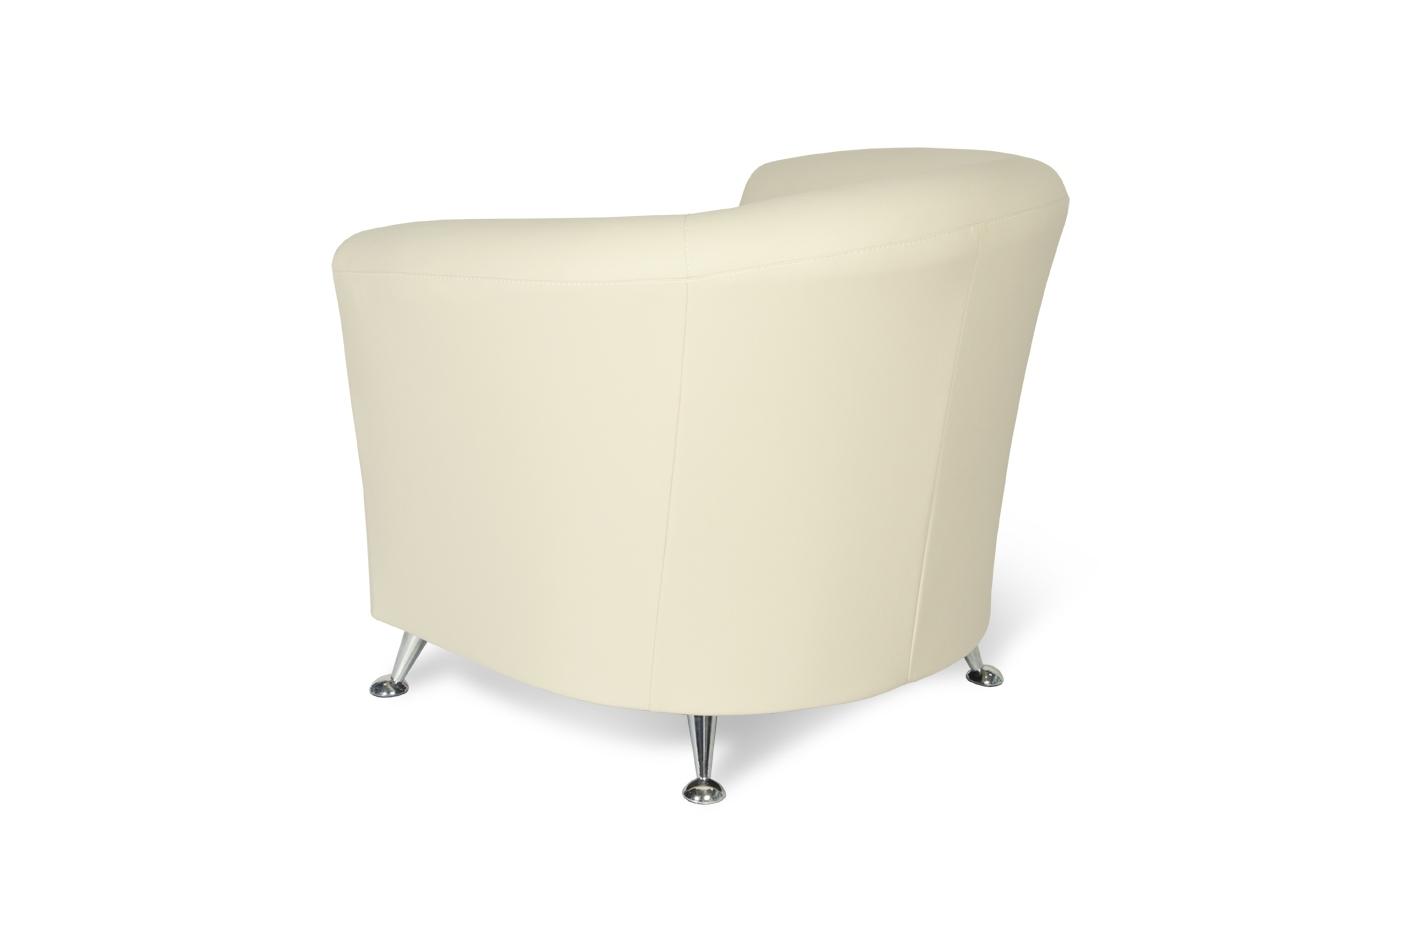 Бонн кресло К/З орегон 3023 - 2